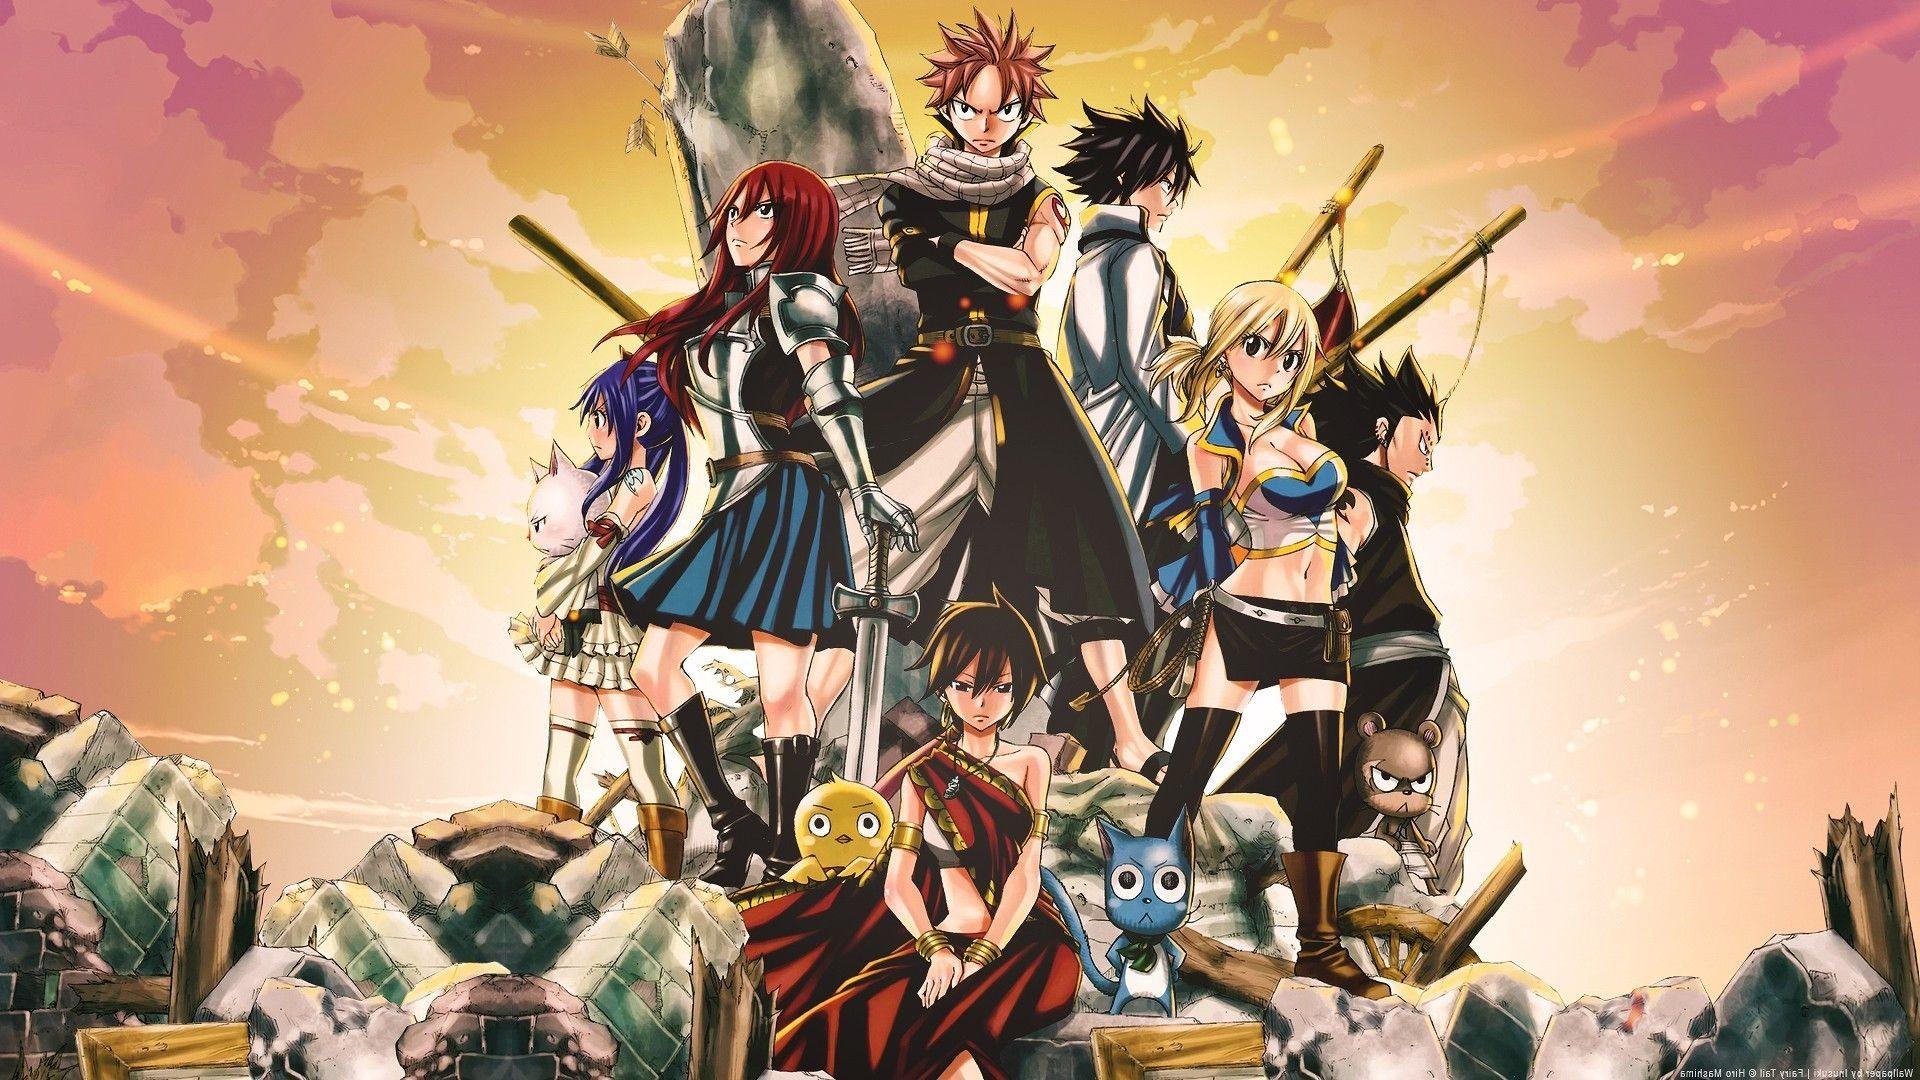 anime, Fairy Tail, Scarlet Erza, Fullbuster Gray, Dragneel Natsu . …